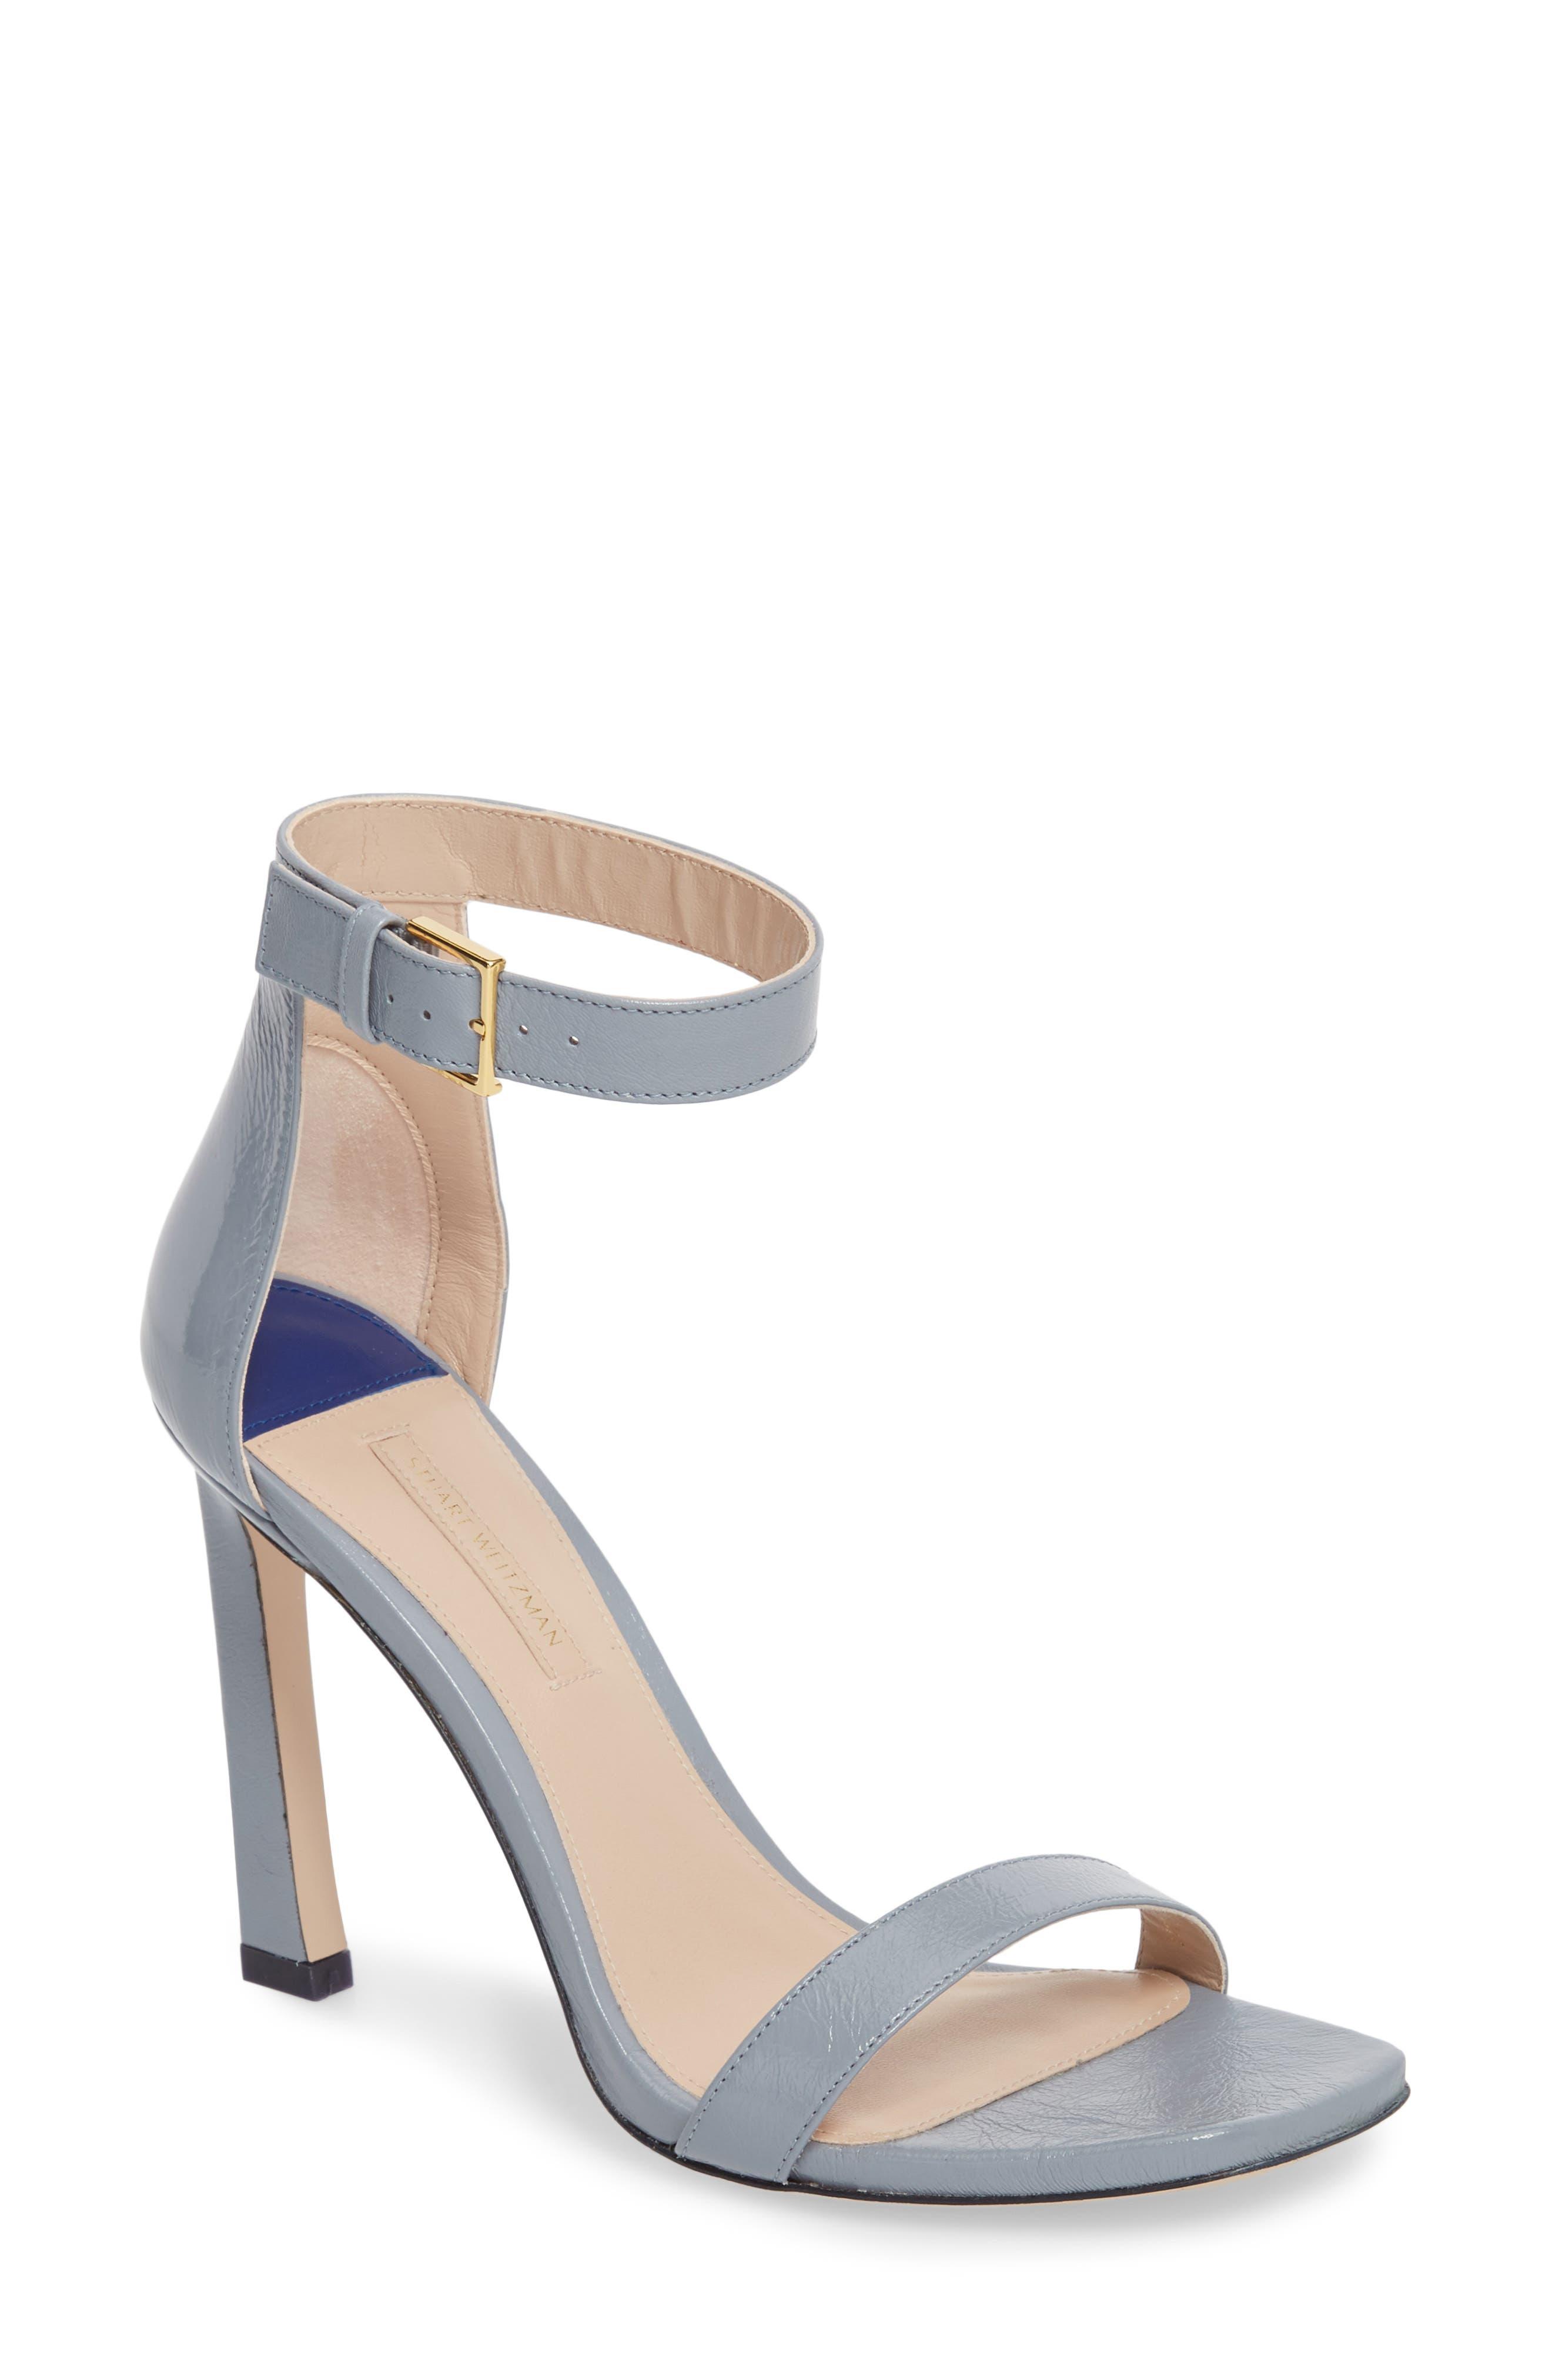 Alternate Image 1 Selected - Stuart Weitzman 100SQUARENUDIST Sandal (Women)